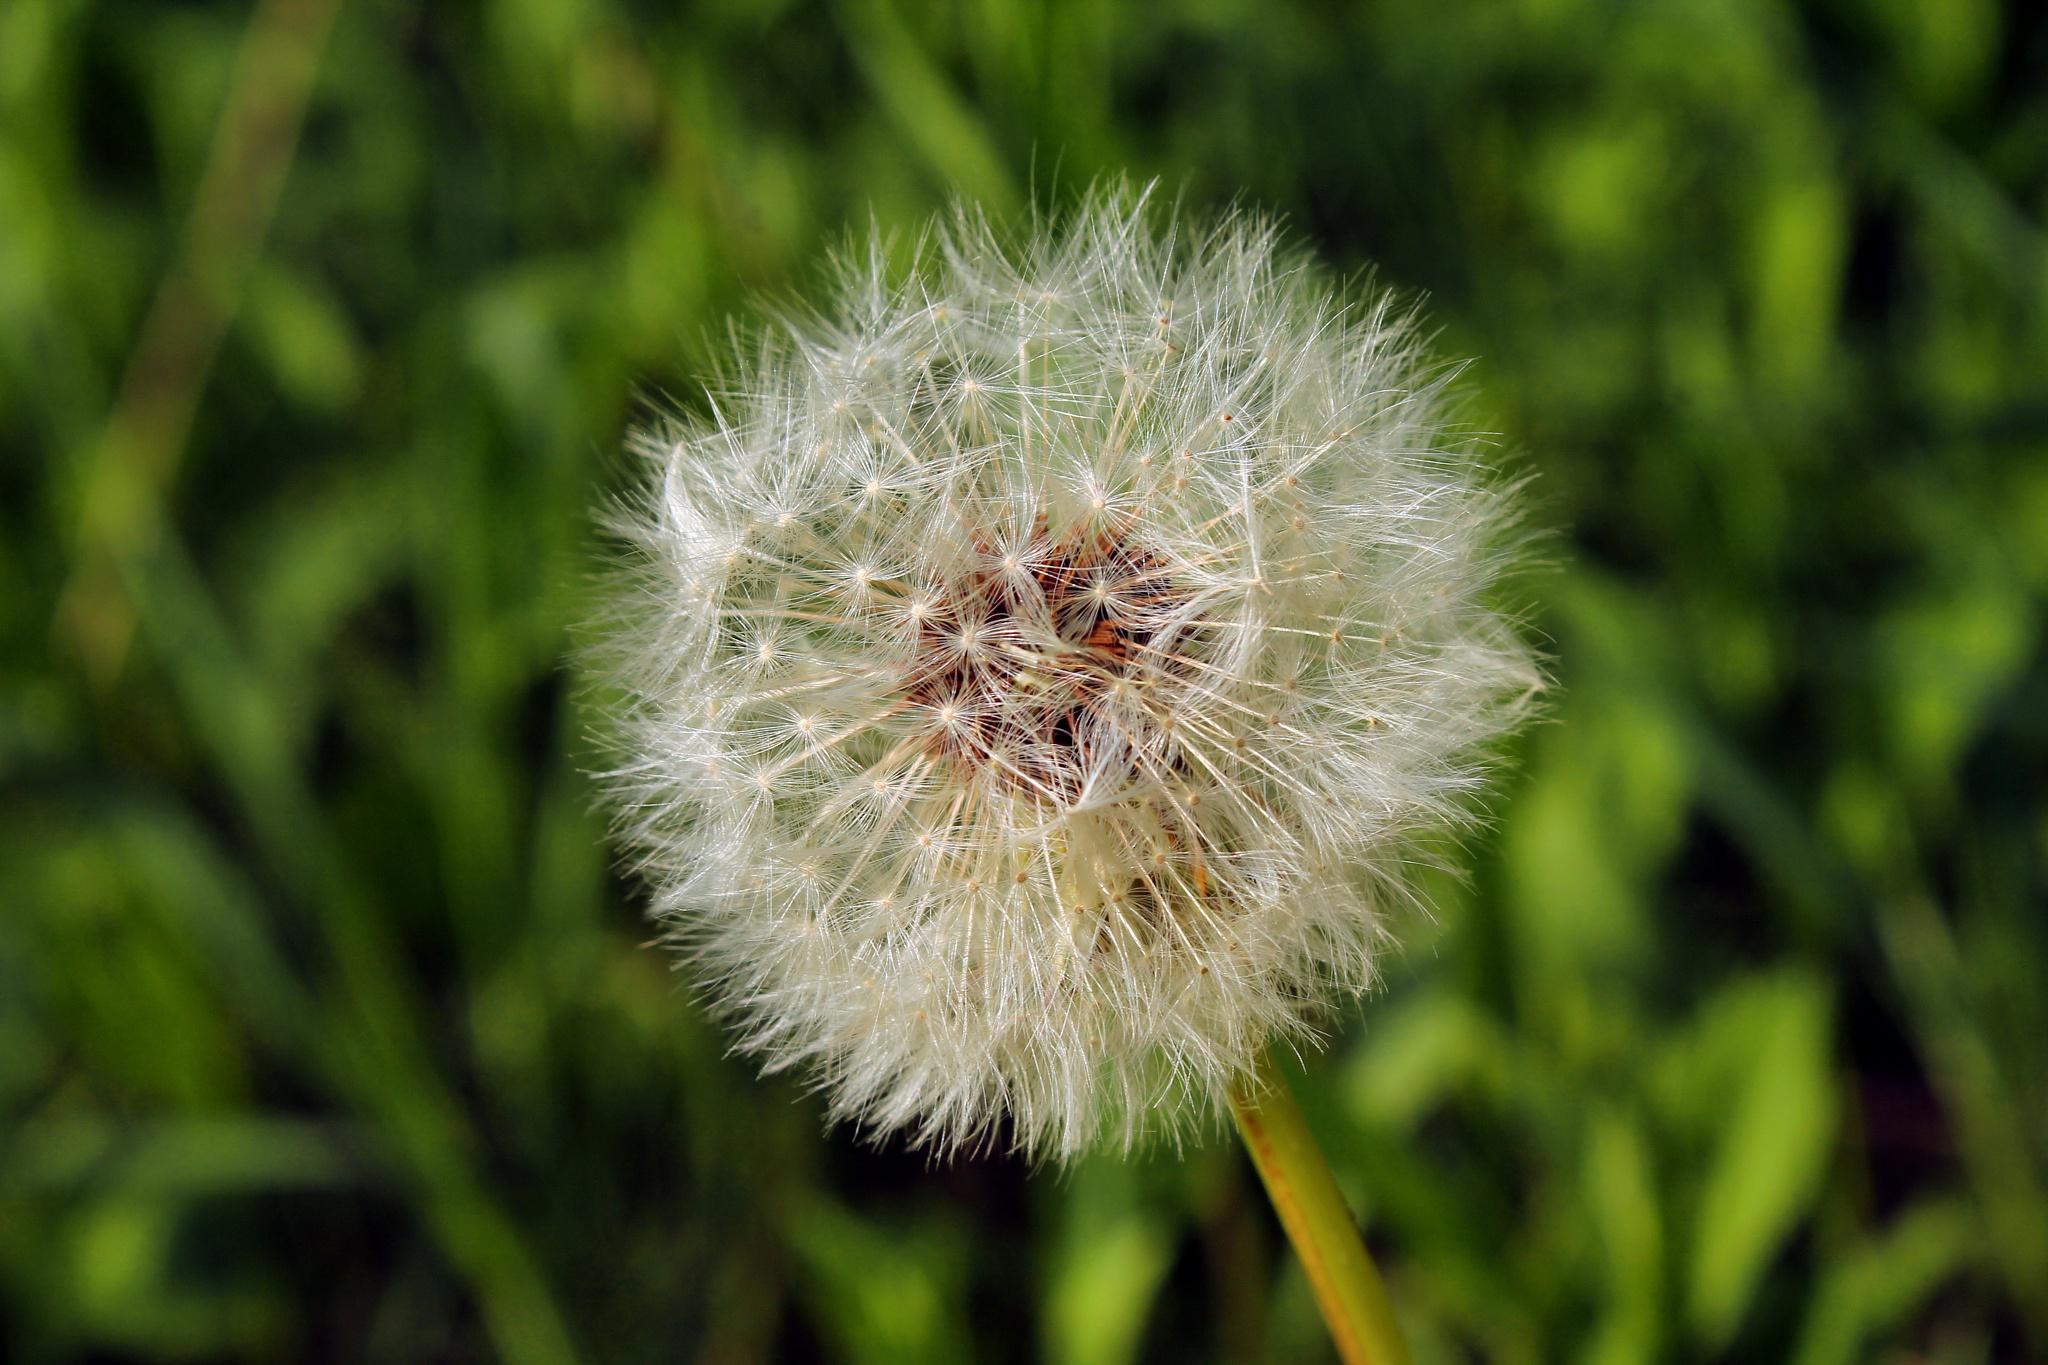 Allergy season by mickie gordon